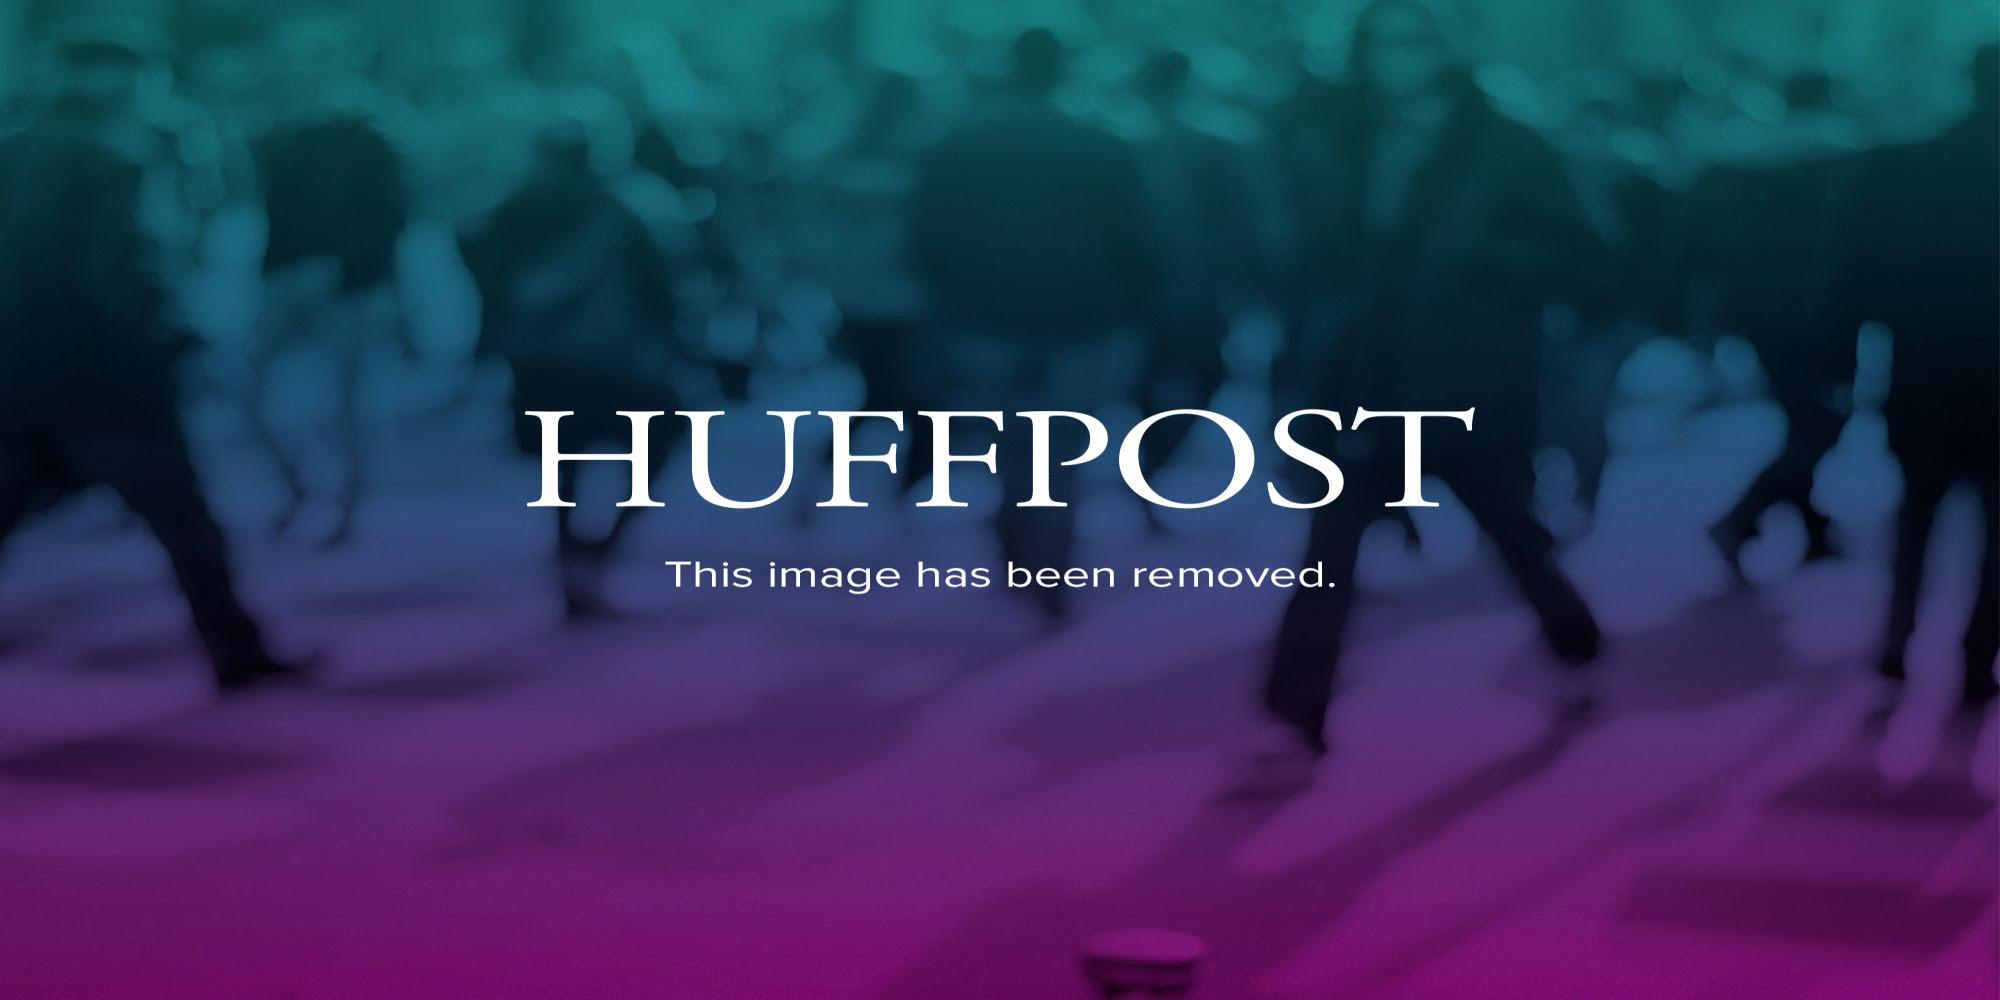 http://i.huffpost.com/gen/1965221/thumbs/o-RIOT-POLICE-FERGUSON-facebook.jpg